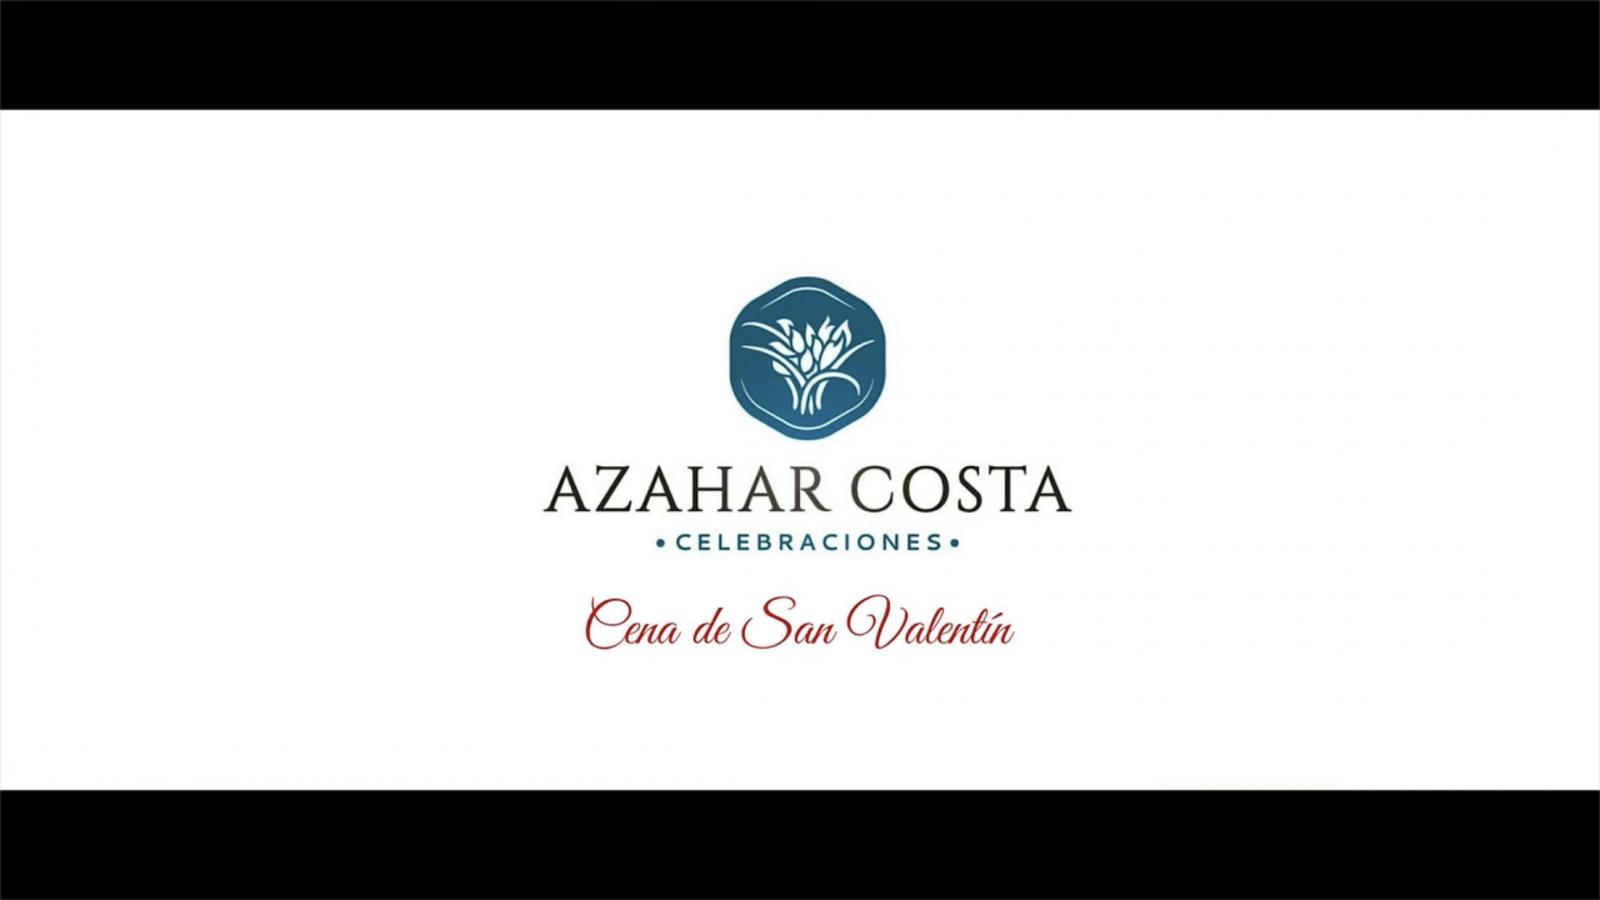 Evento Cena San Valentin Azahar Costa 2018